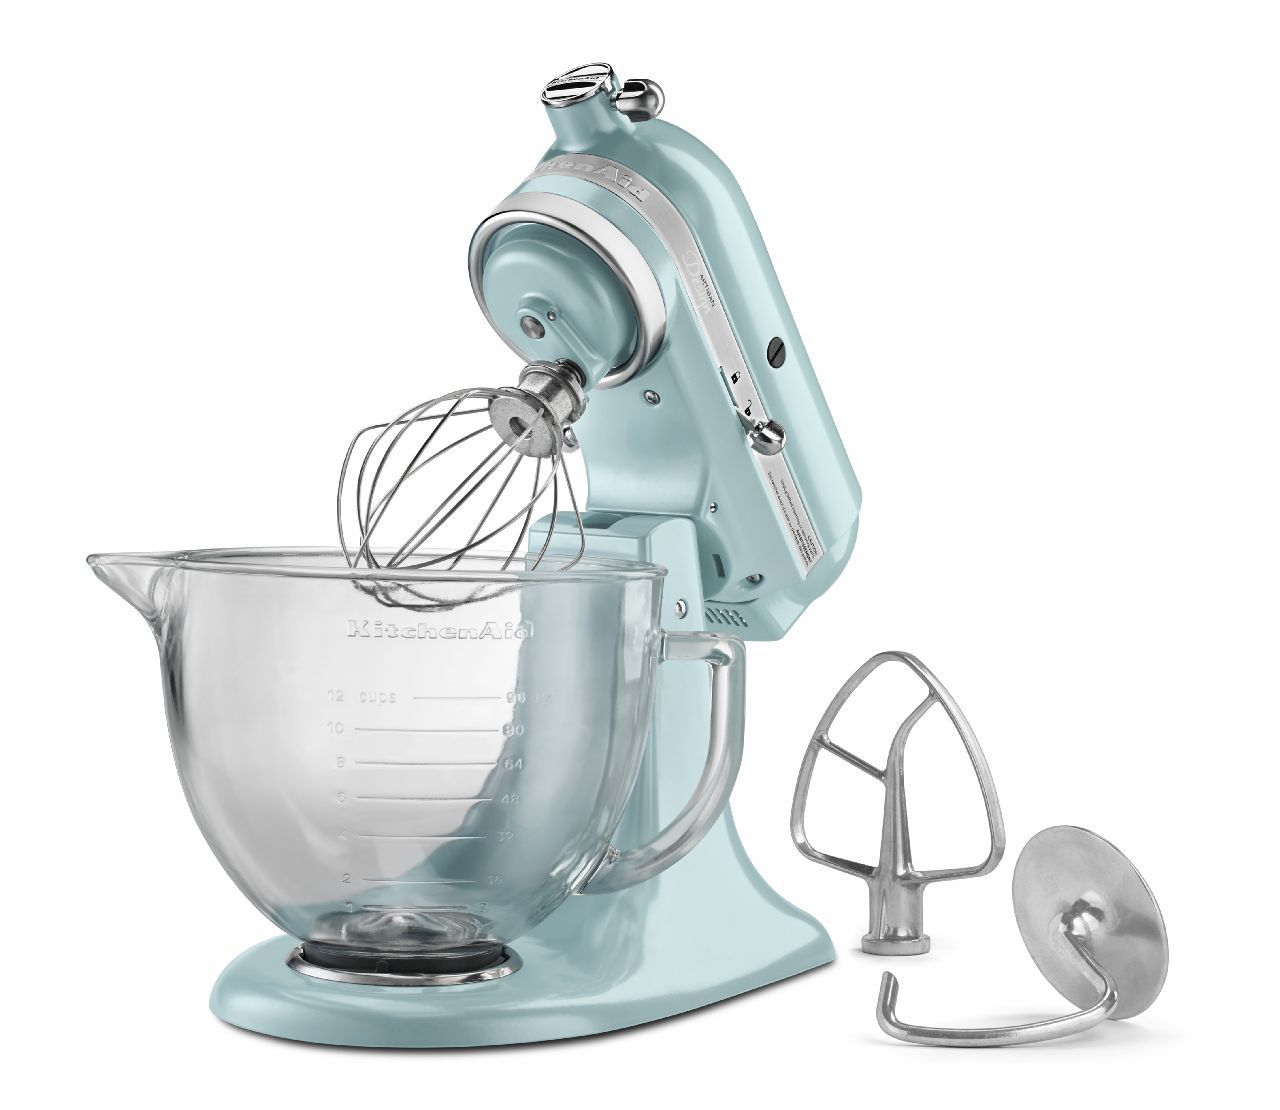 KitchenAid Artisan Design Blue Stand Mixer - KSM155GBAZ